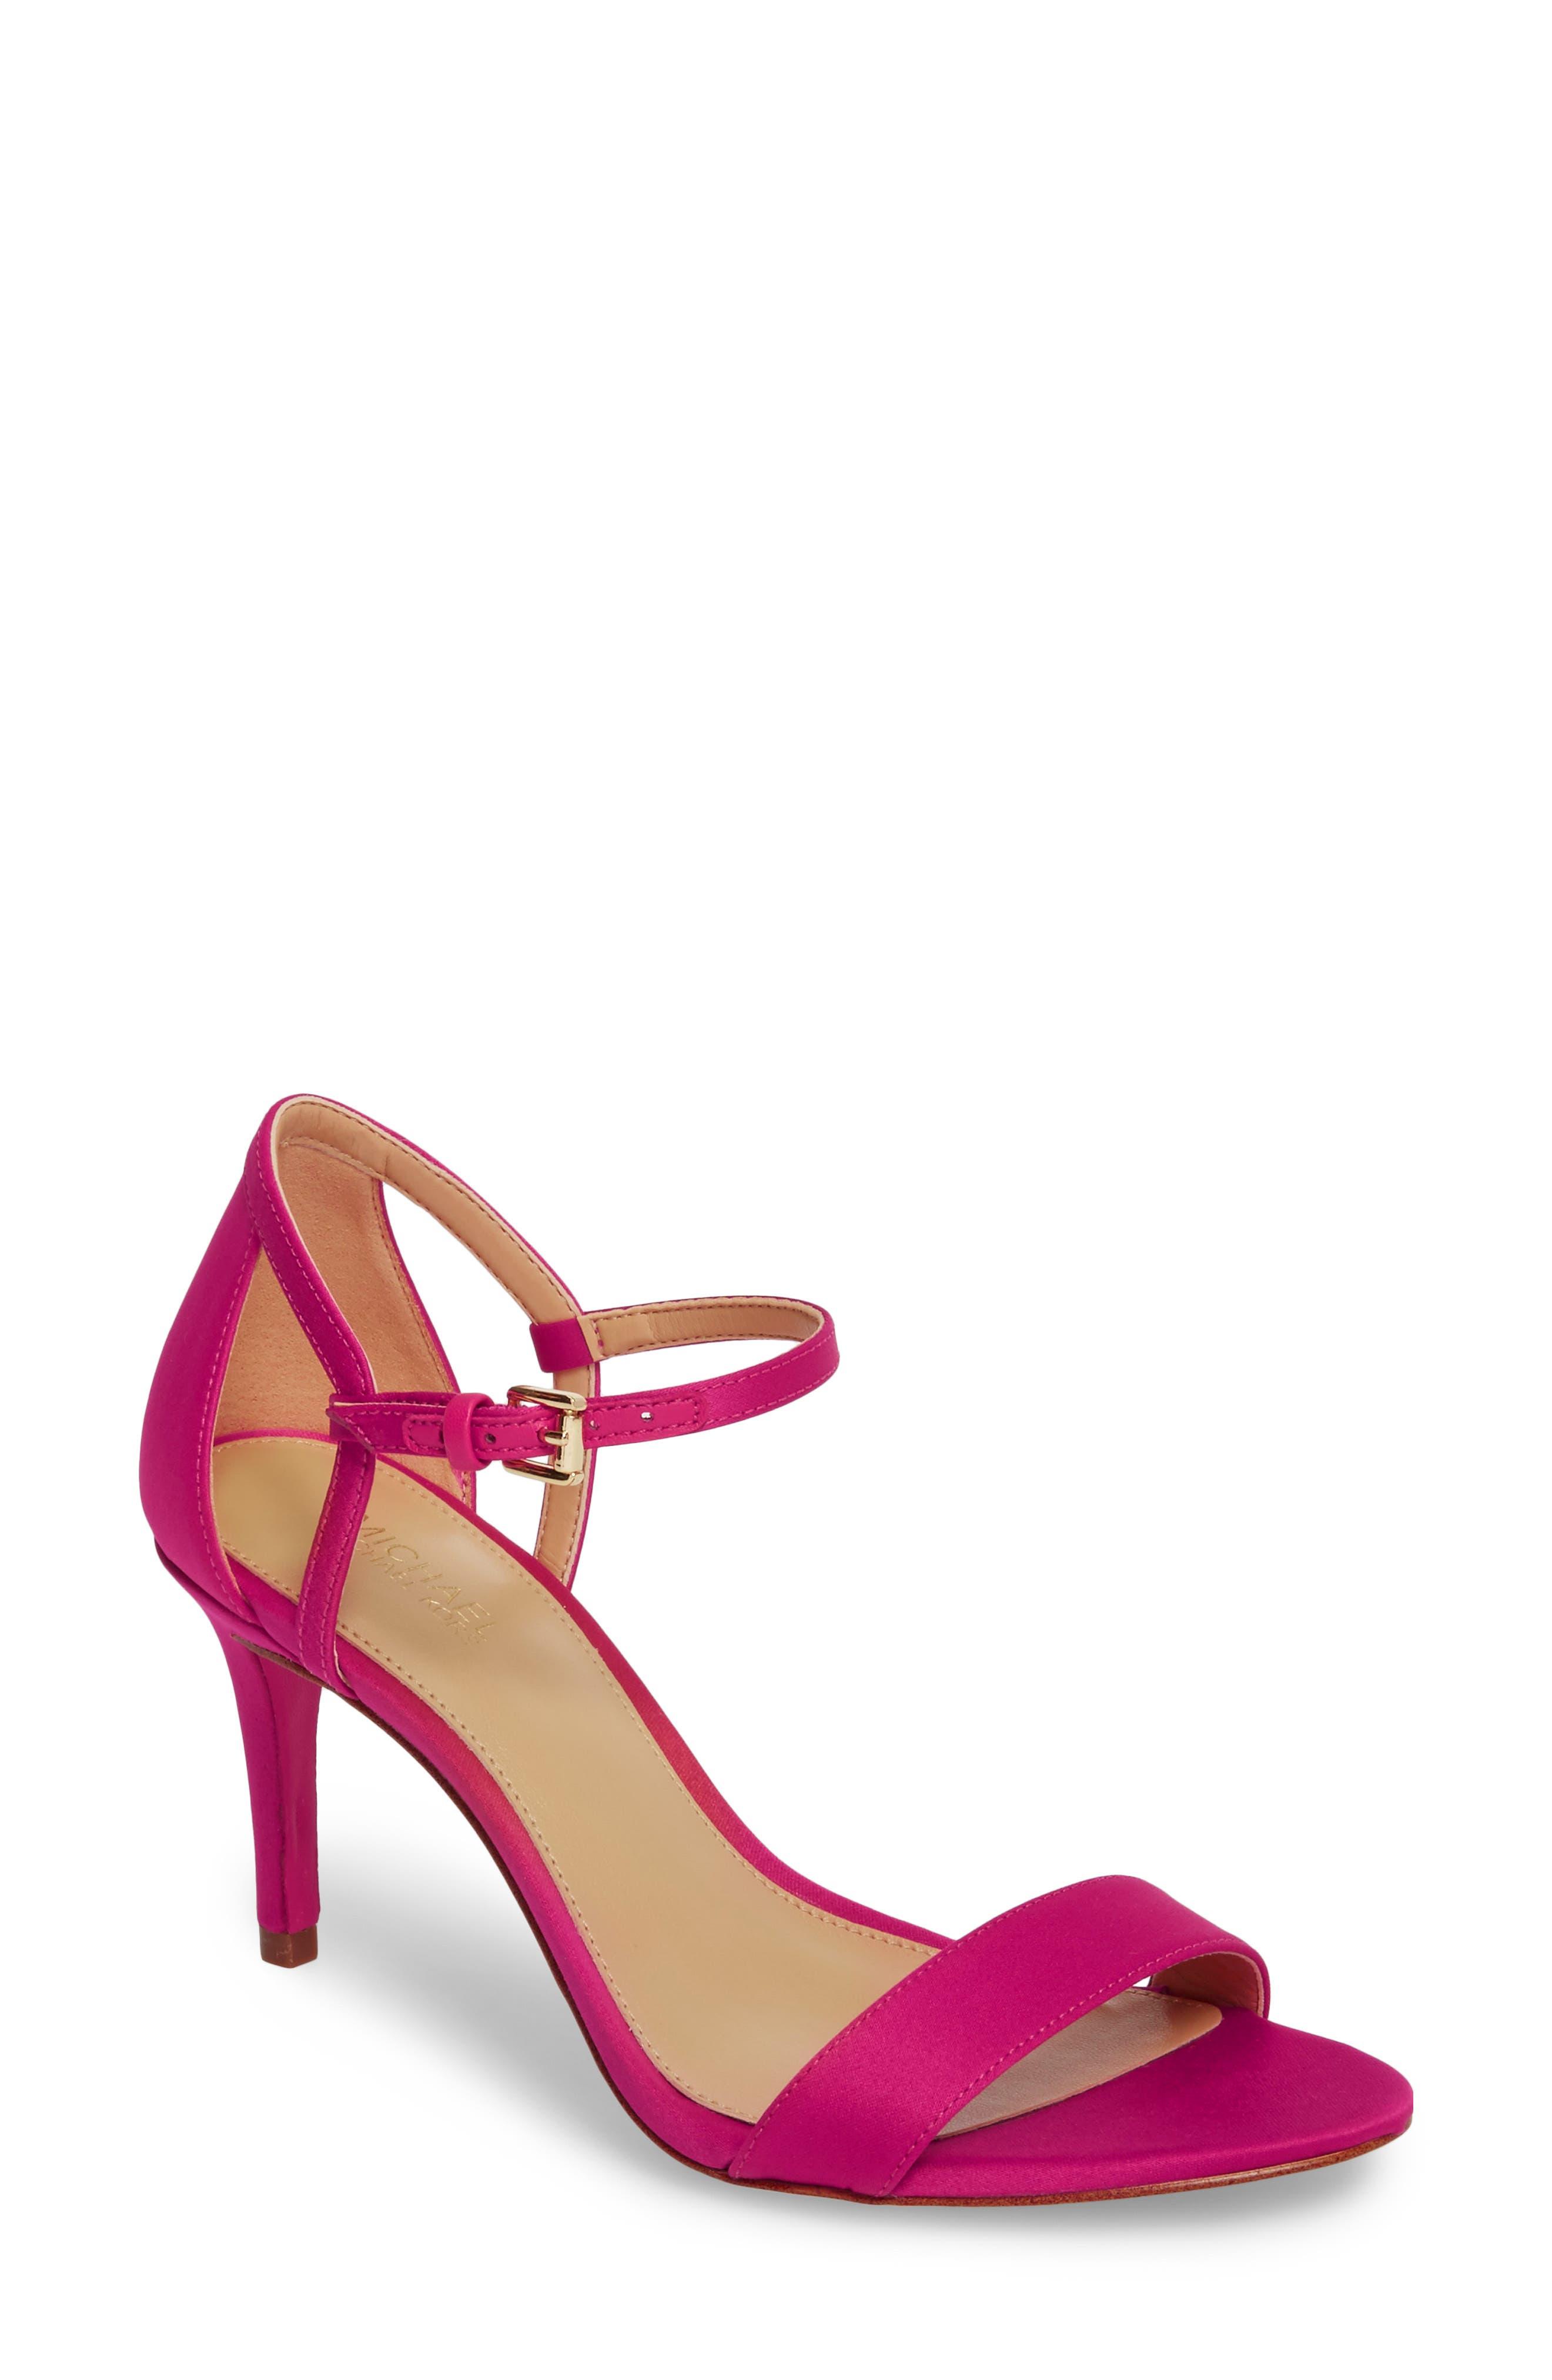 'Simone' Sandal,                         Main,                         color, Ultra Pink Satin